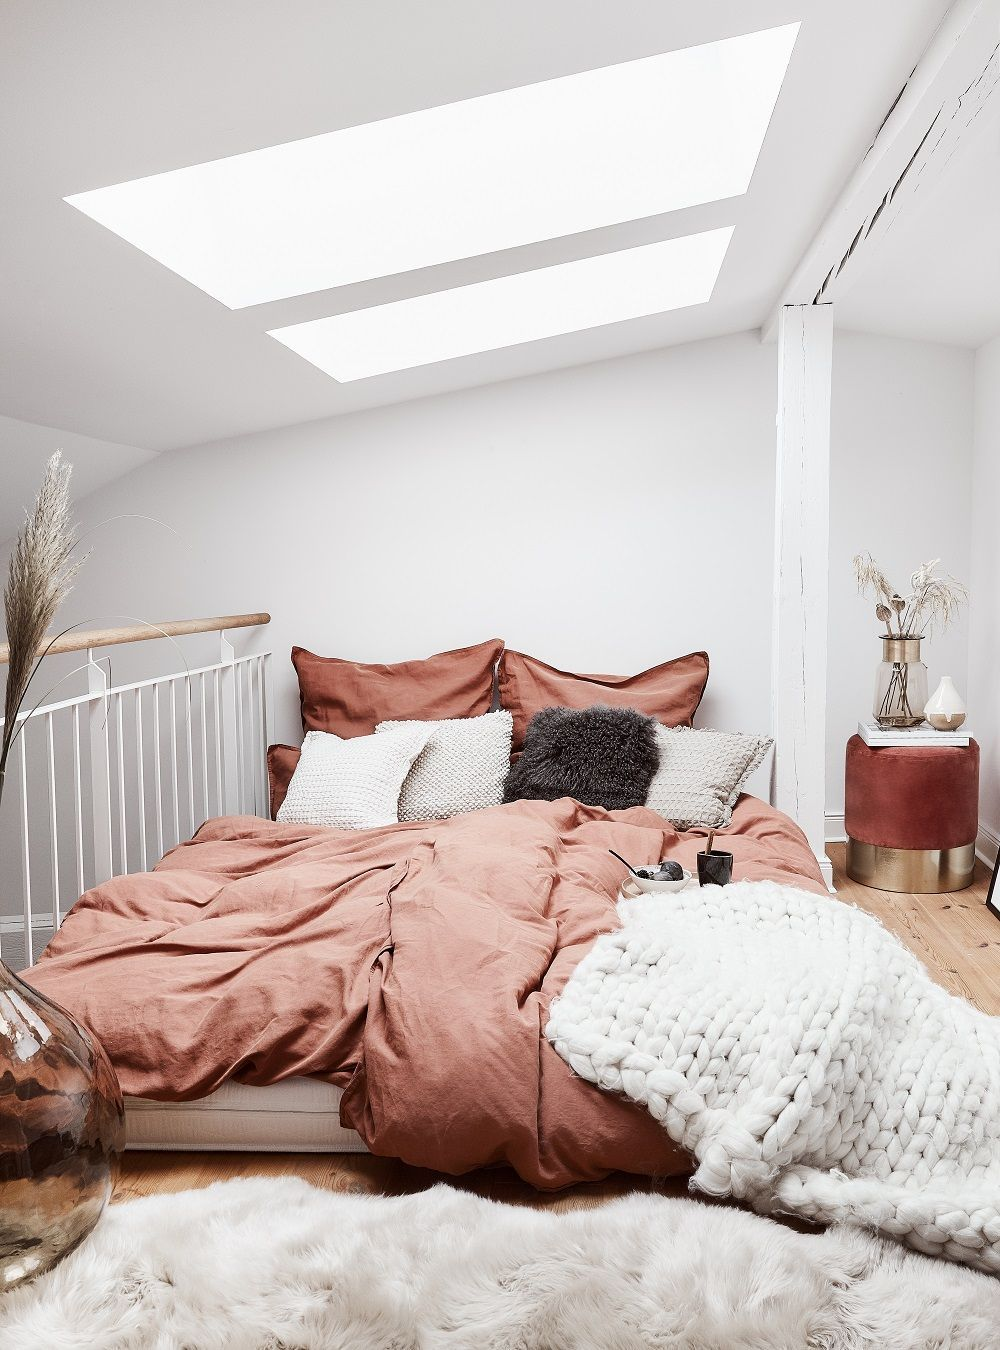 Leinen Bettwasche Carla Ab Ins Bett Westwing In 2019 Home